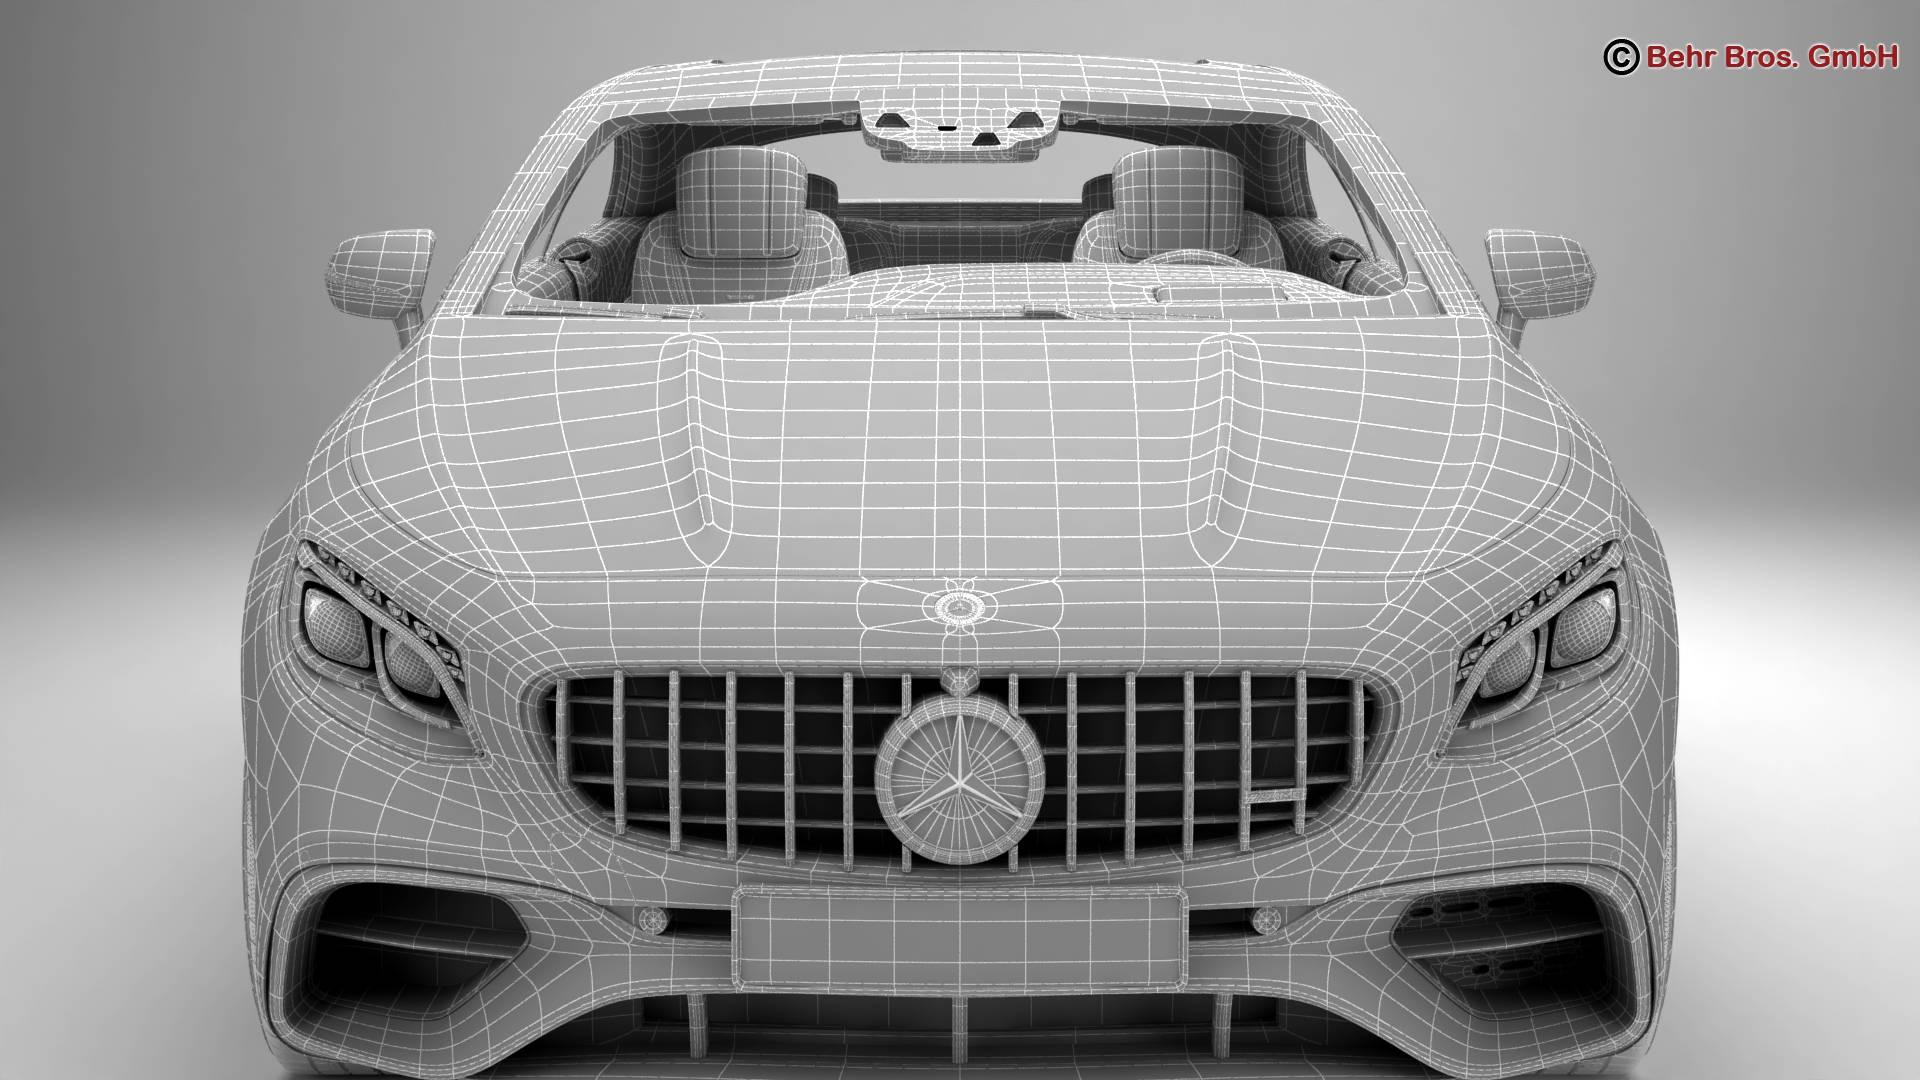 mercedes s class coupe amg s63 2018 3d model 3ds max fbx c4d lwo ma mb obj 274110